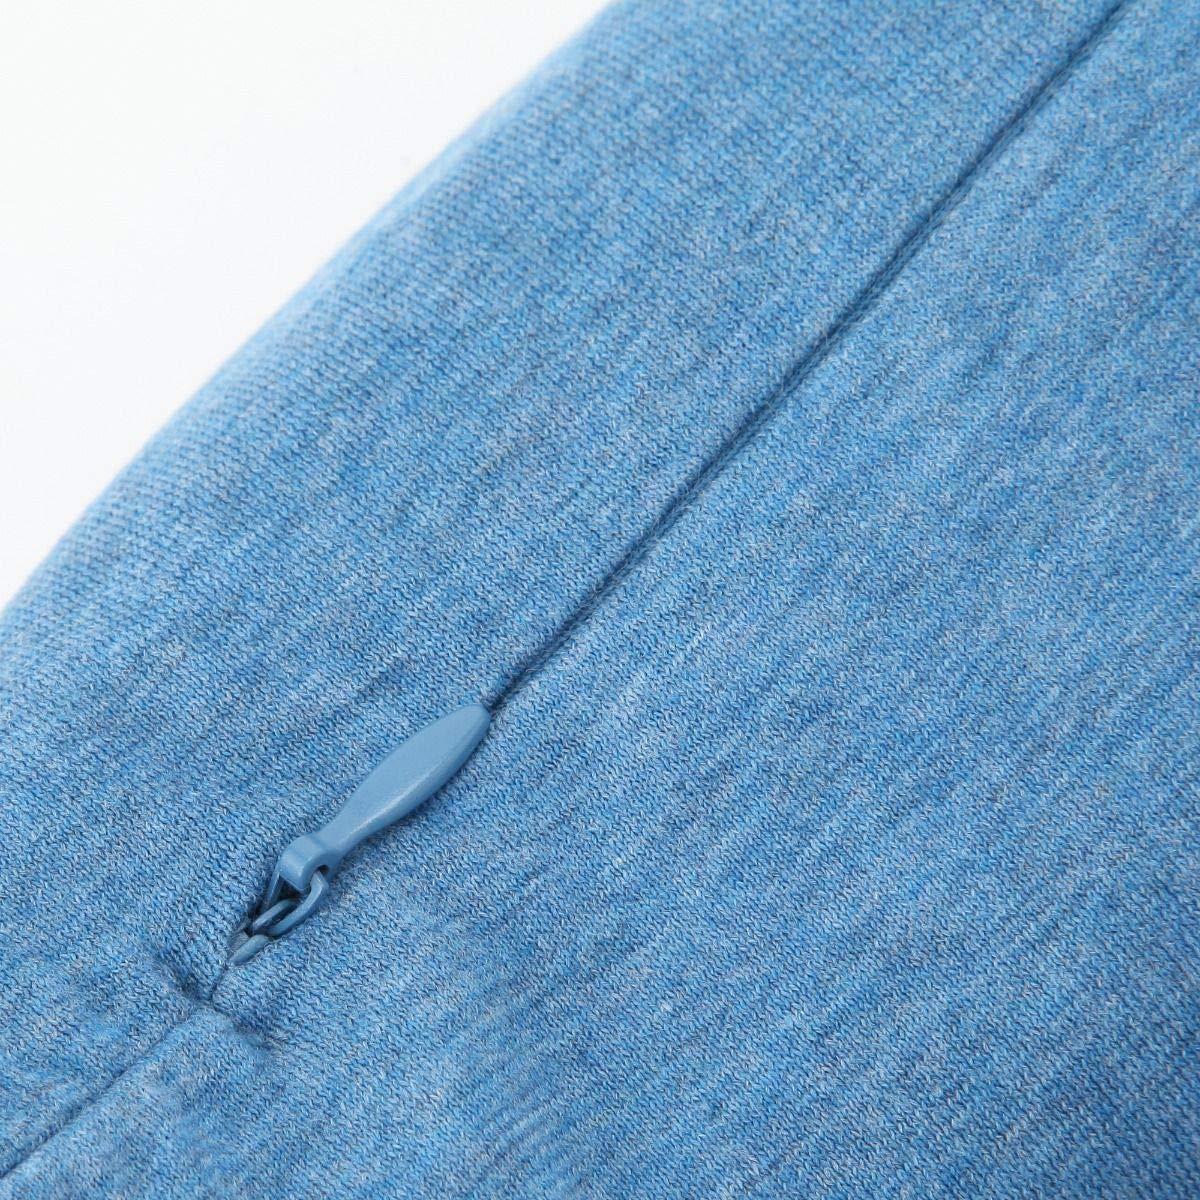 Neck Cushion Blue Microbead Muji Well-Fitted